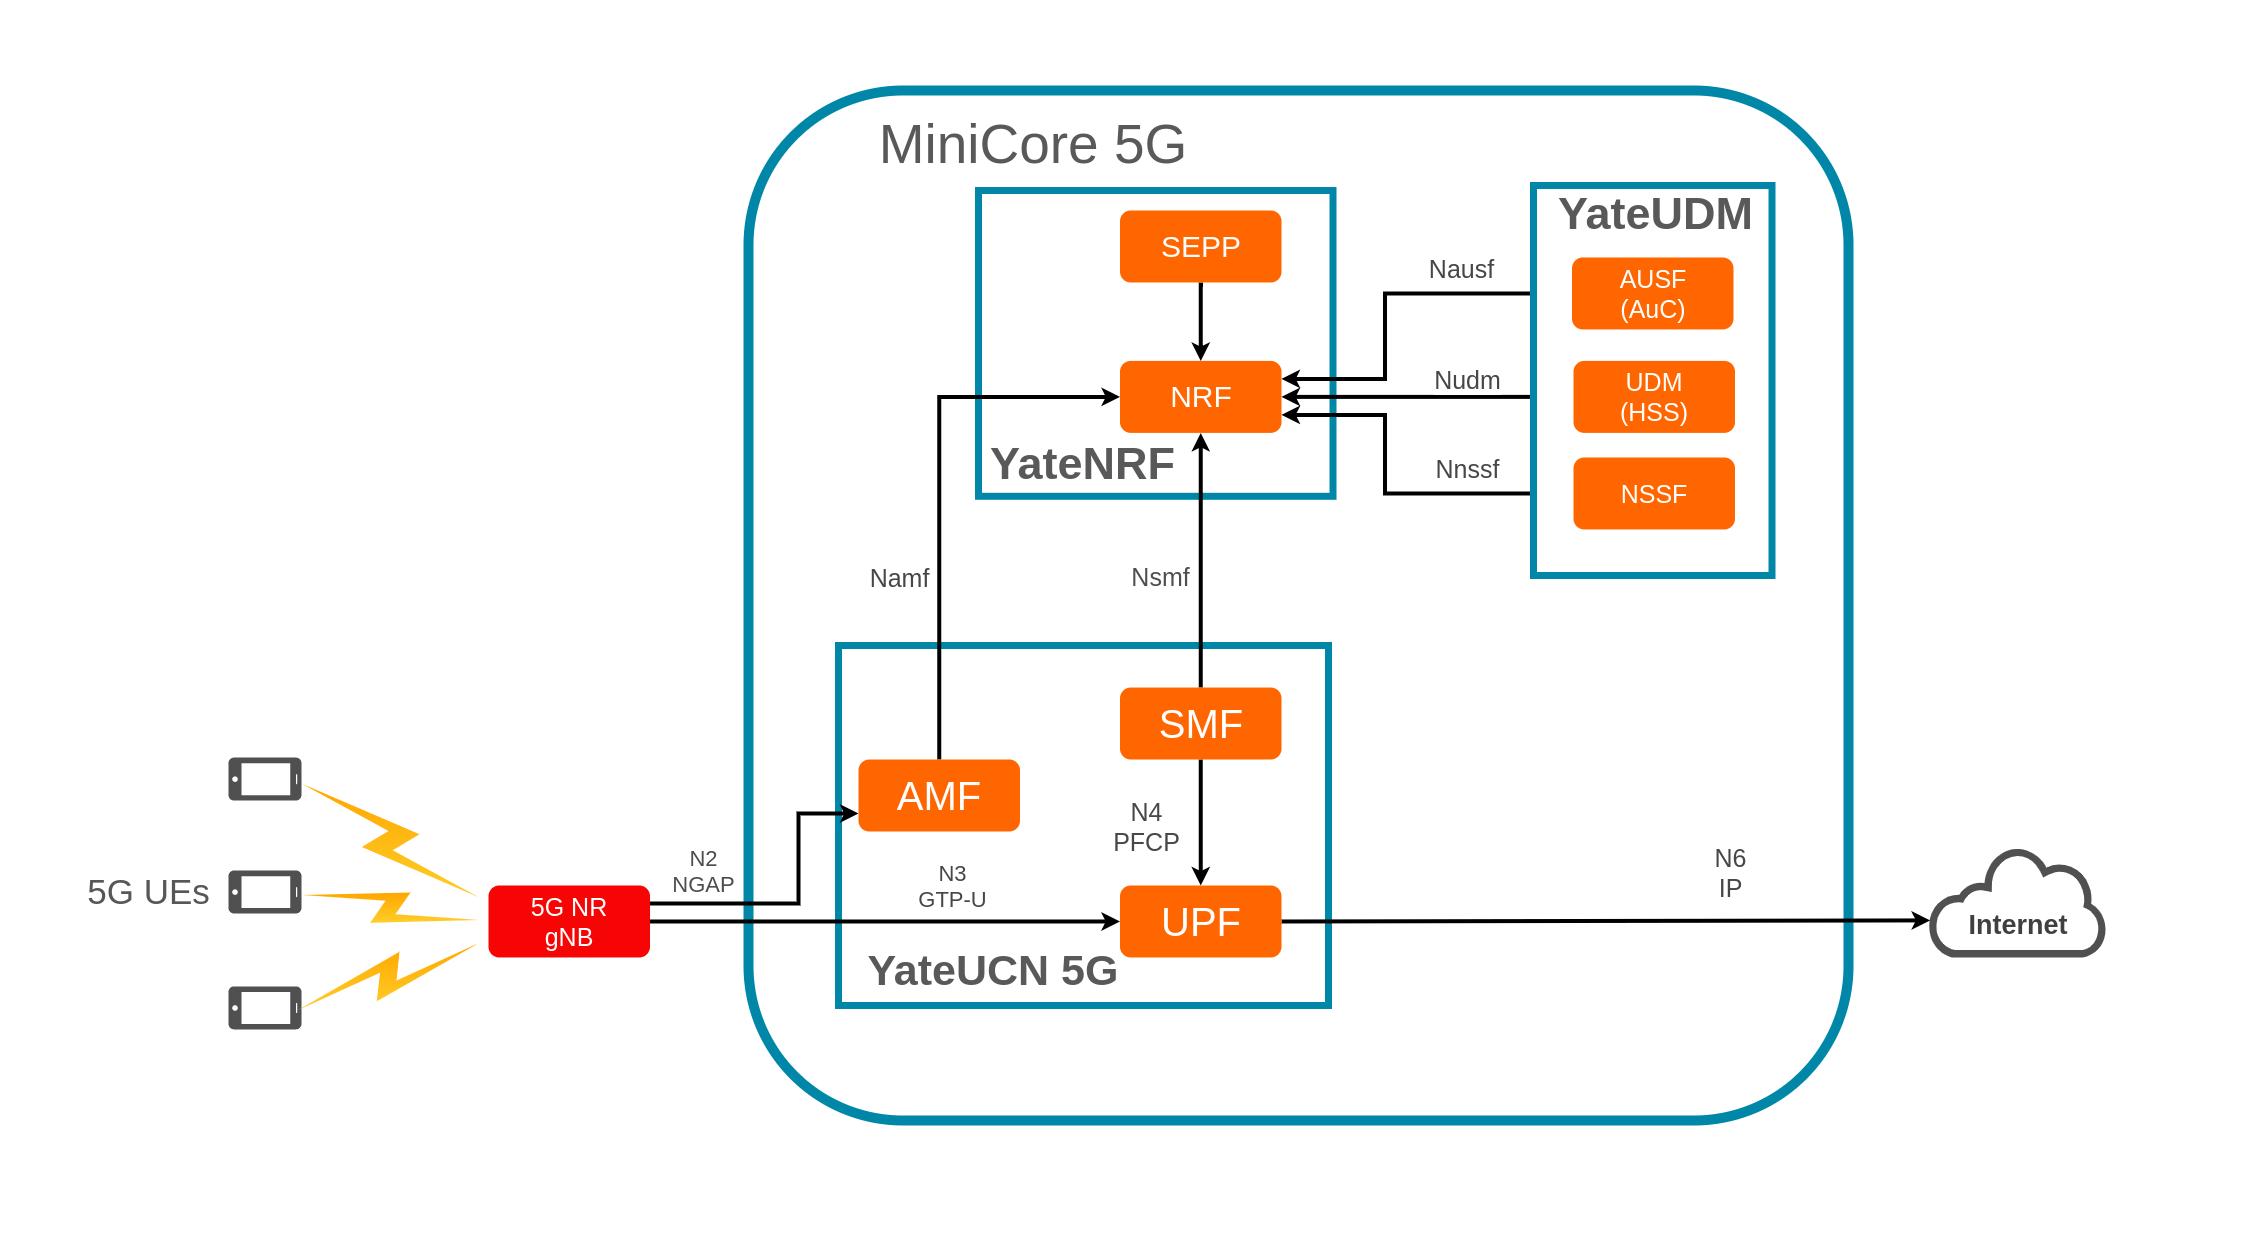 5G Core Network 11